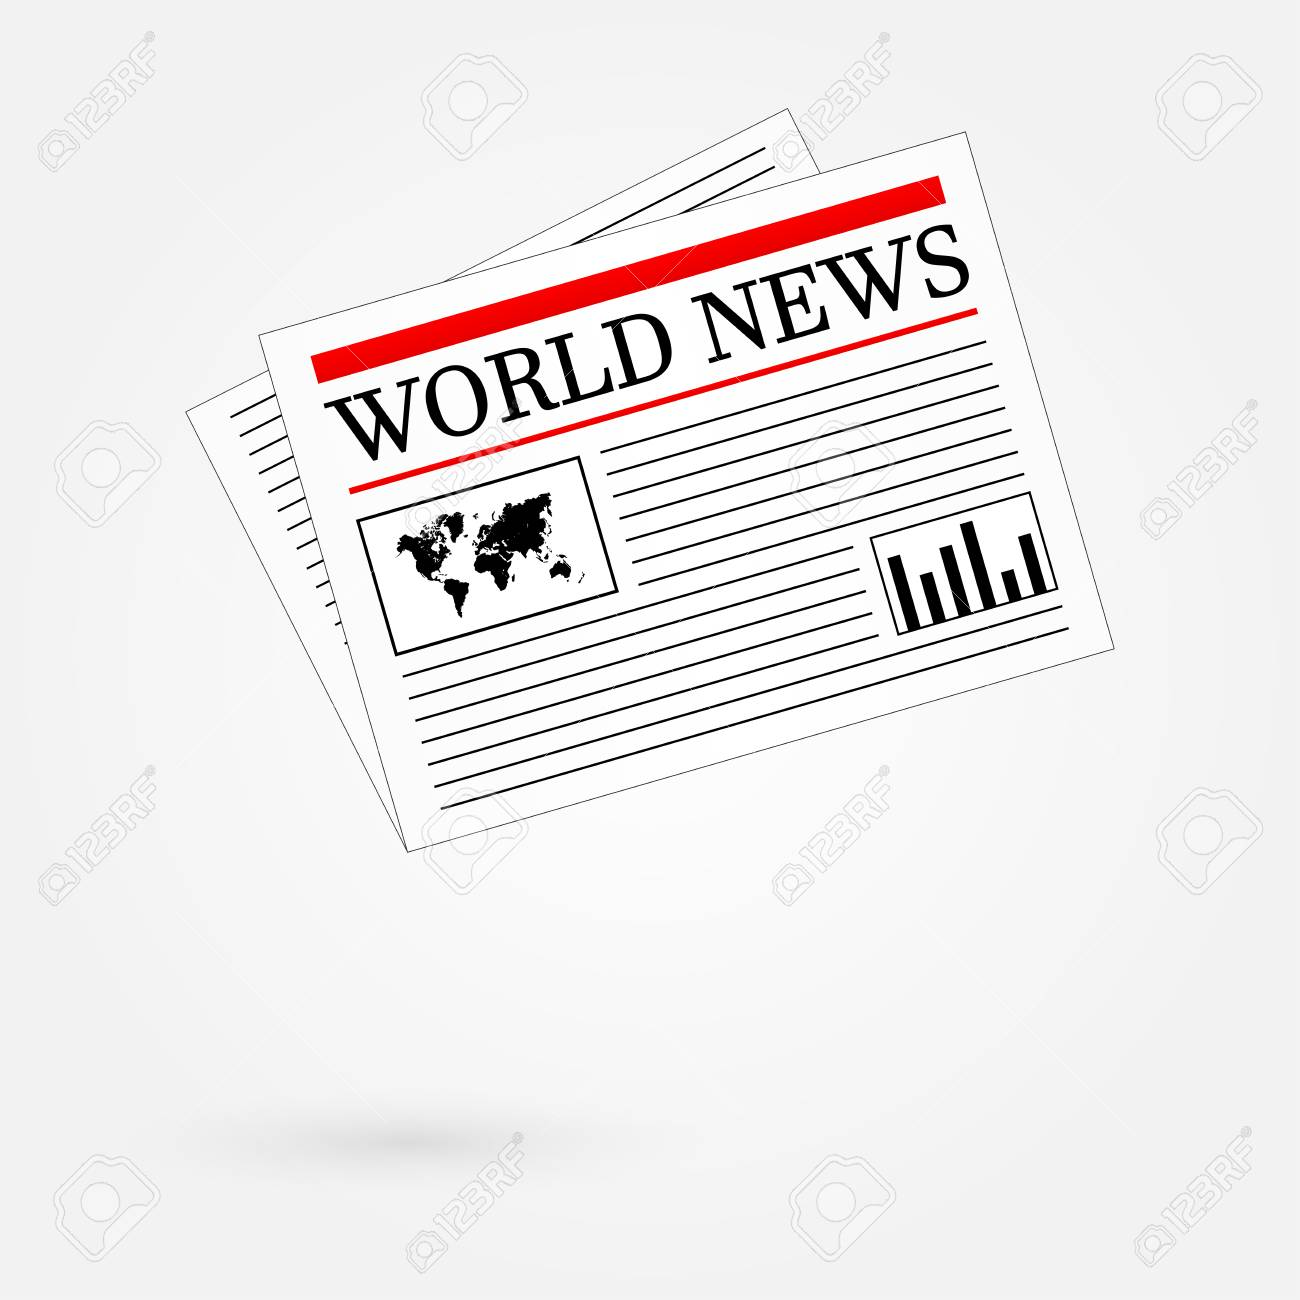 World News Newspaper Stock Vector - 24025322